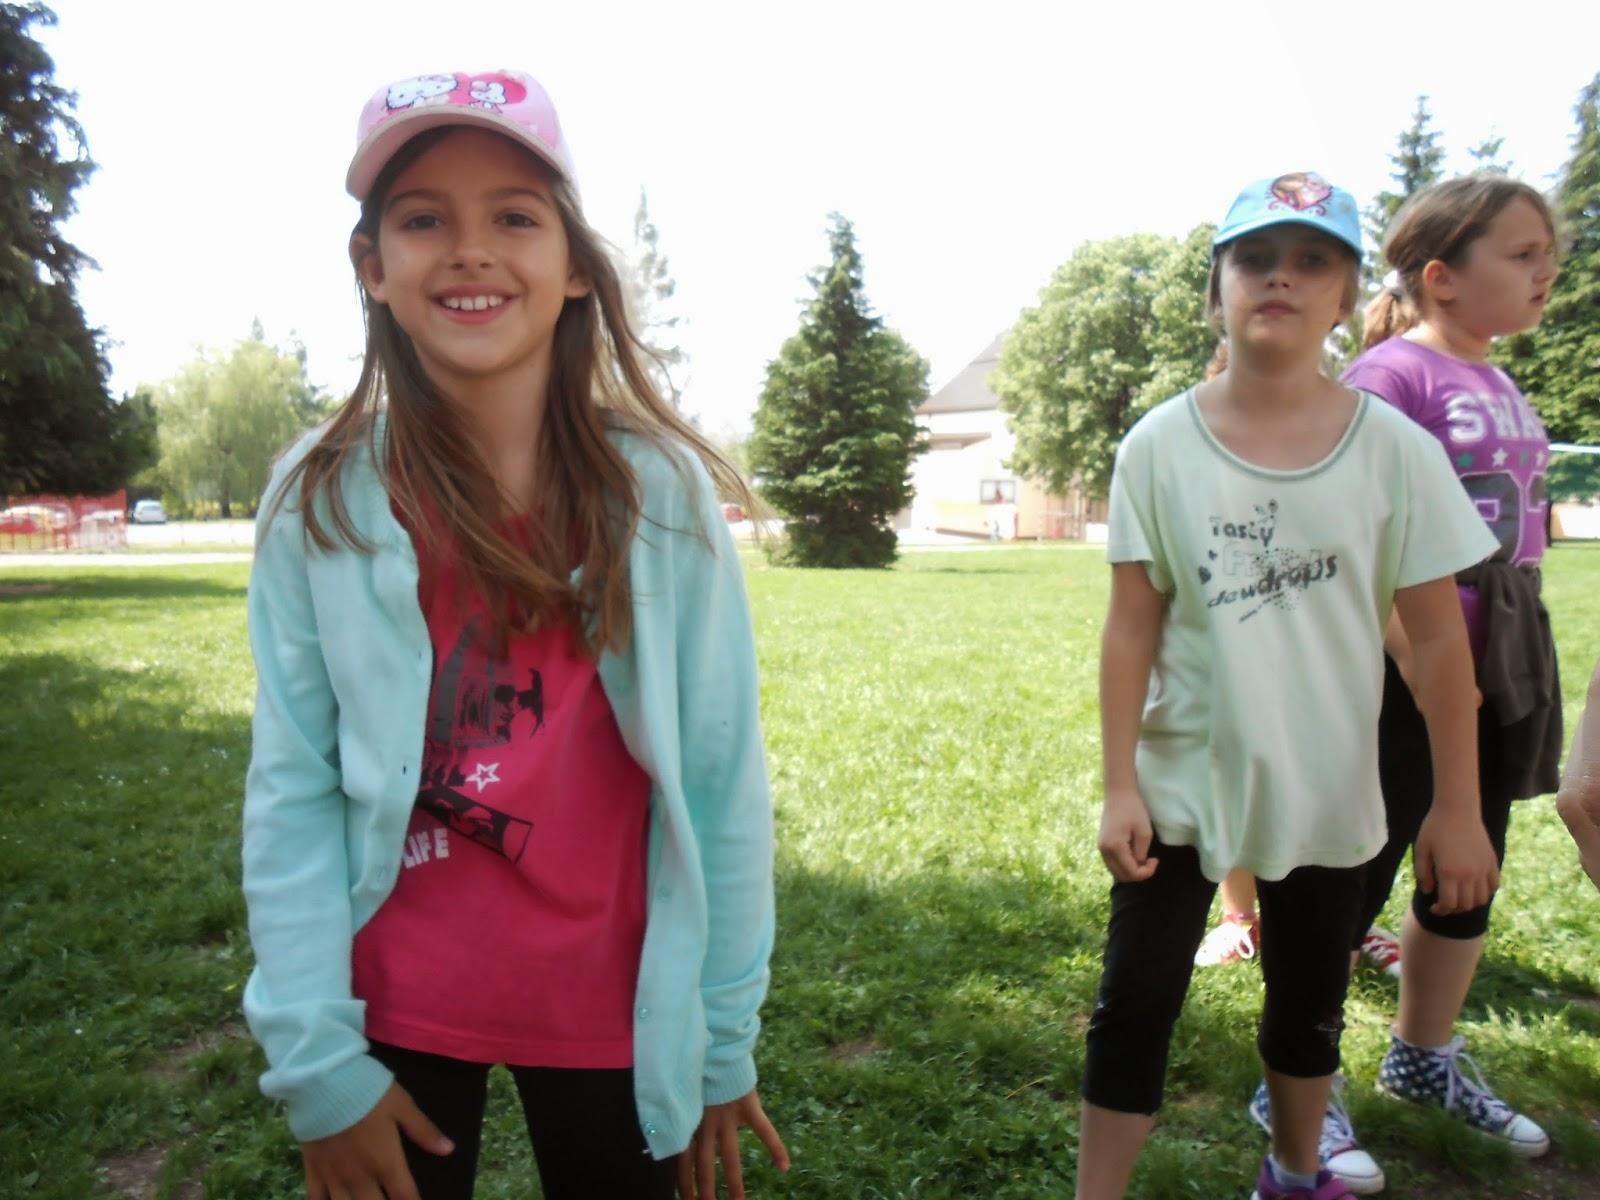 Športni dan 4. a in 4. b, Ilirska Bistrica, 19. 5. 2015 - DSCN4663.JPG